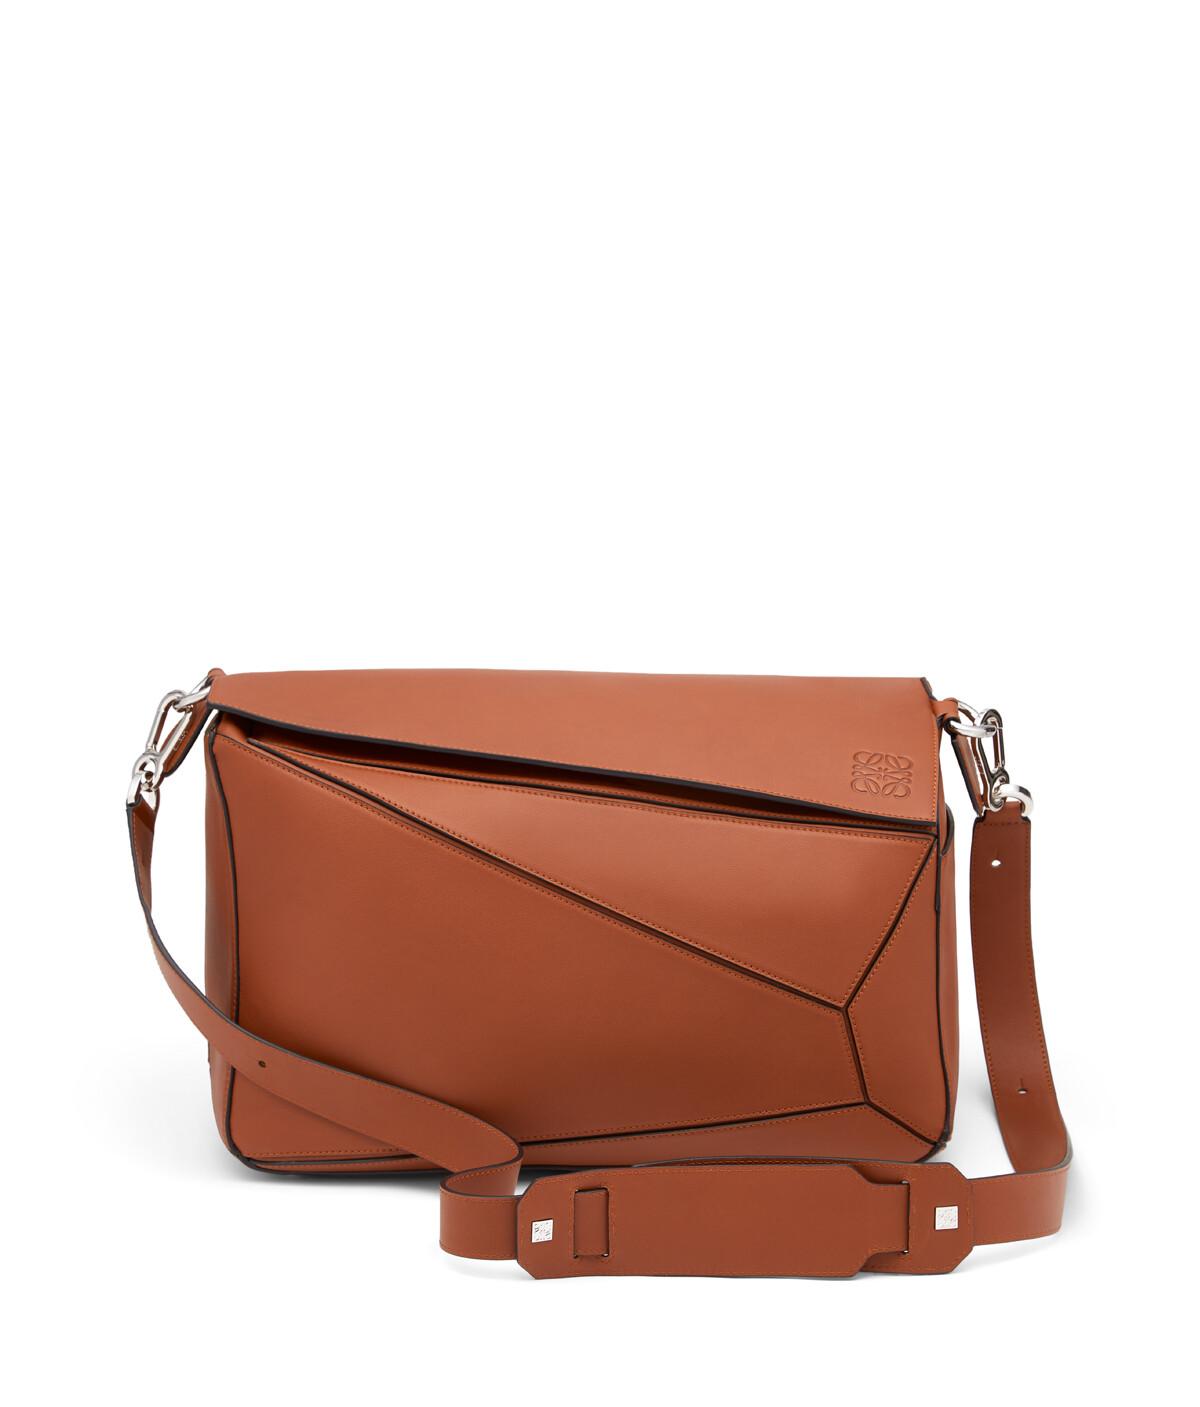 LOEWE Puzzle Xl Bag Rust Color front